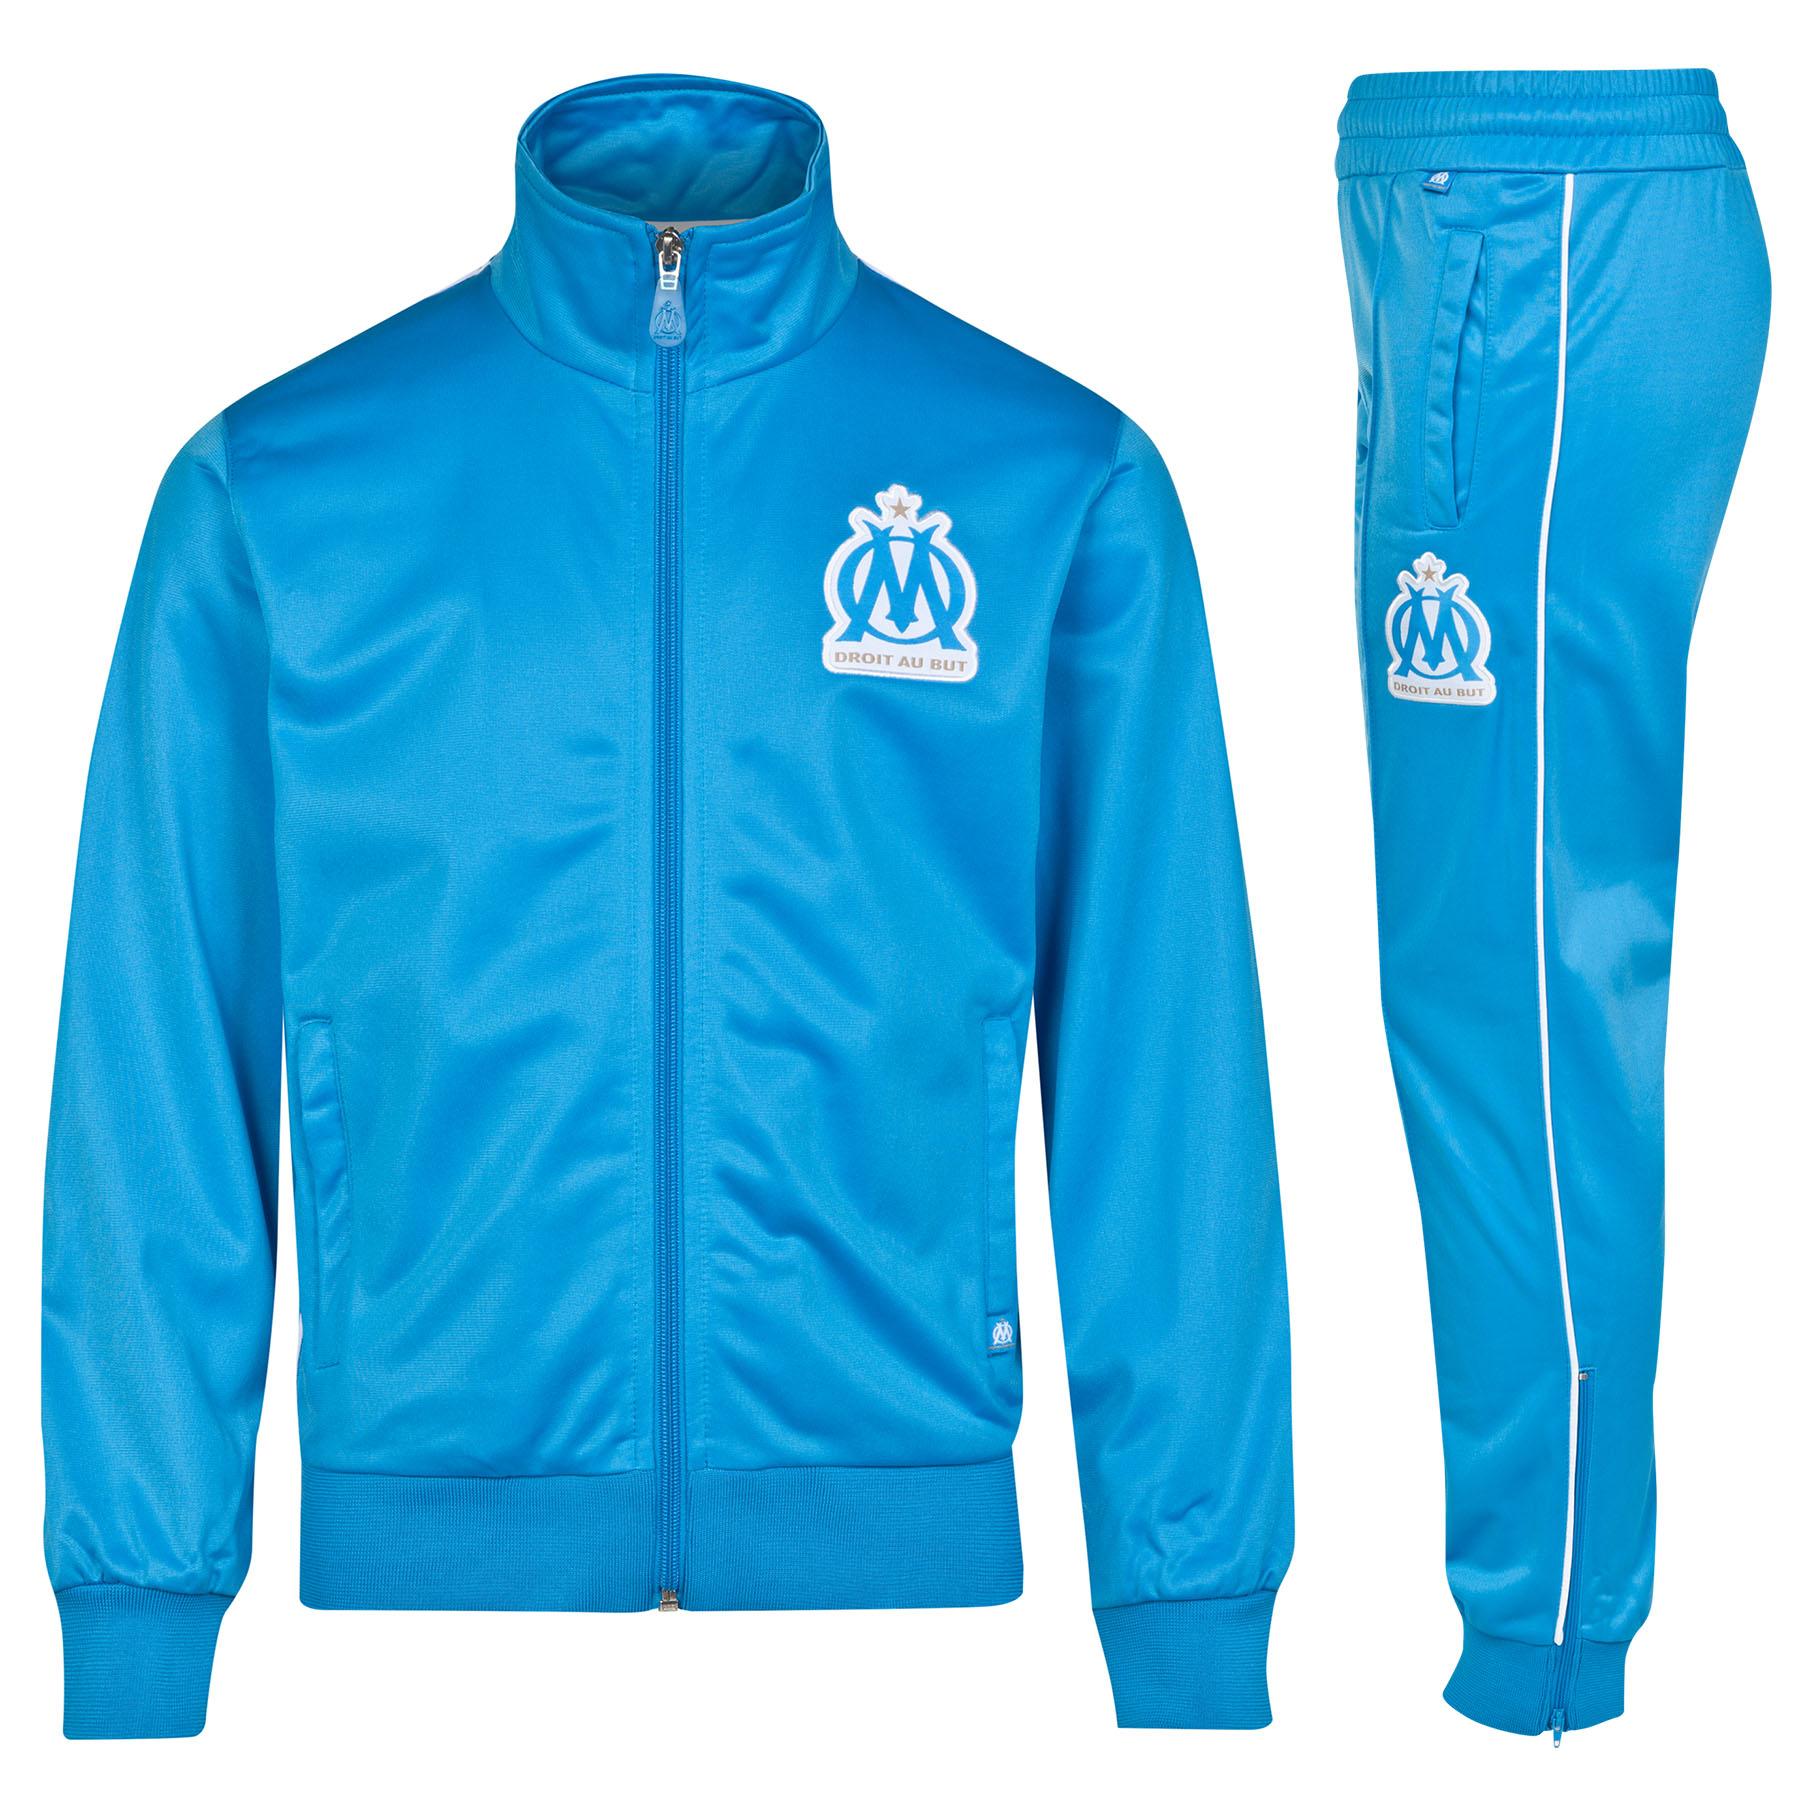 Olympique de Marseille Tracksuit - Blue - Boys